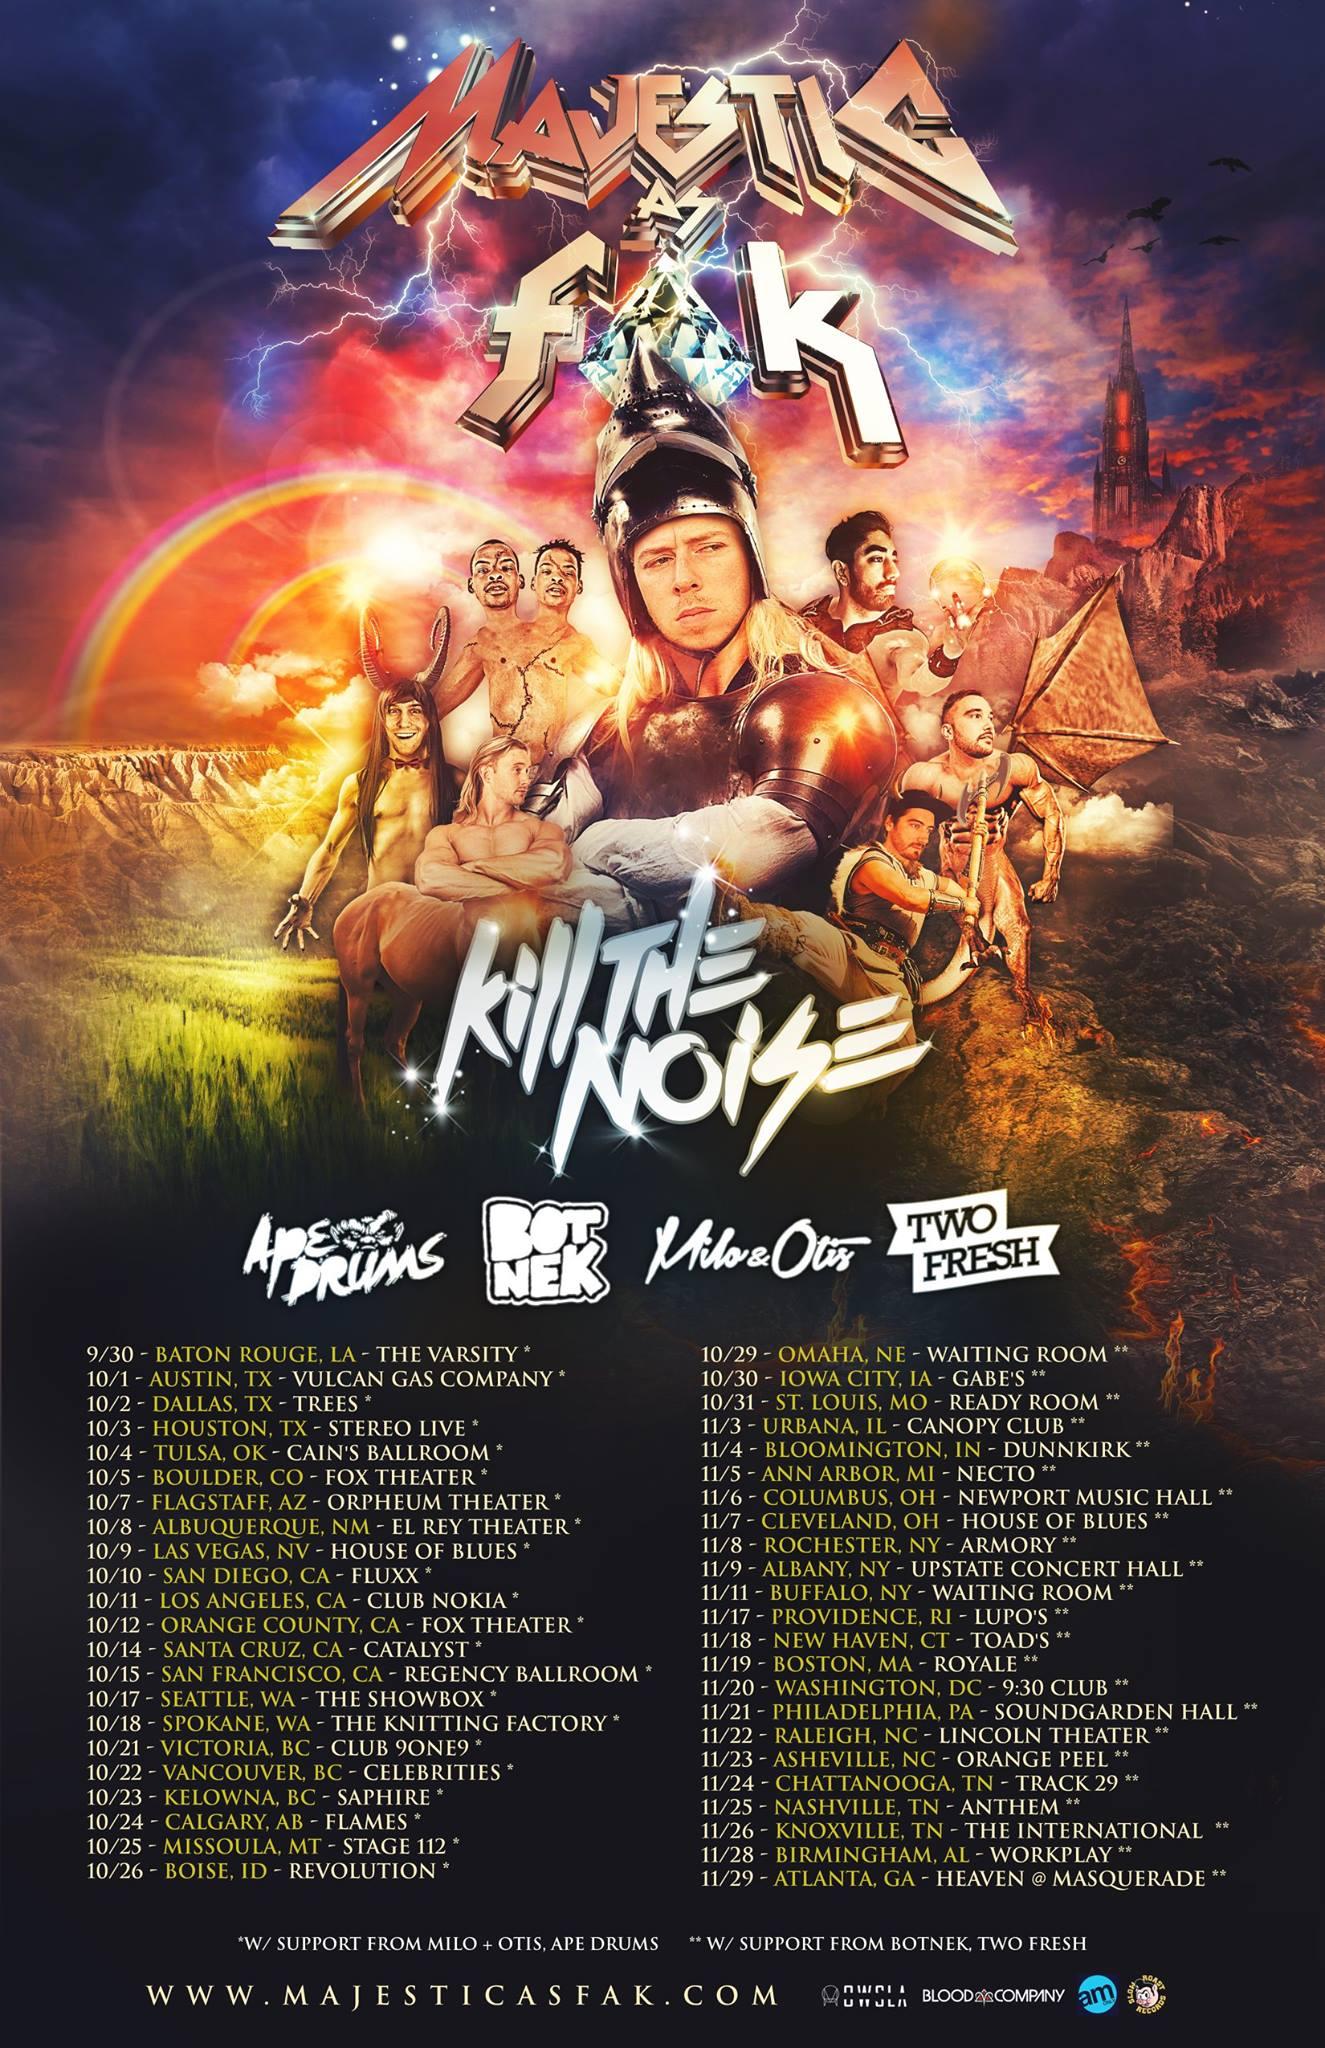 Kill The Noise's Majestic As Fak tour poster